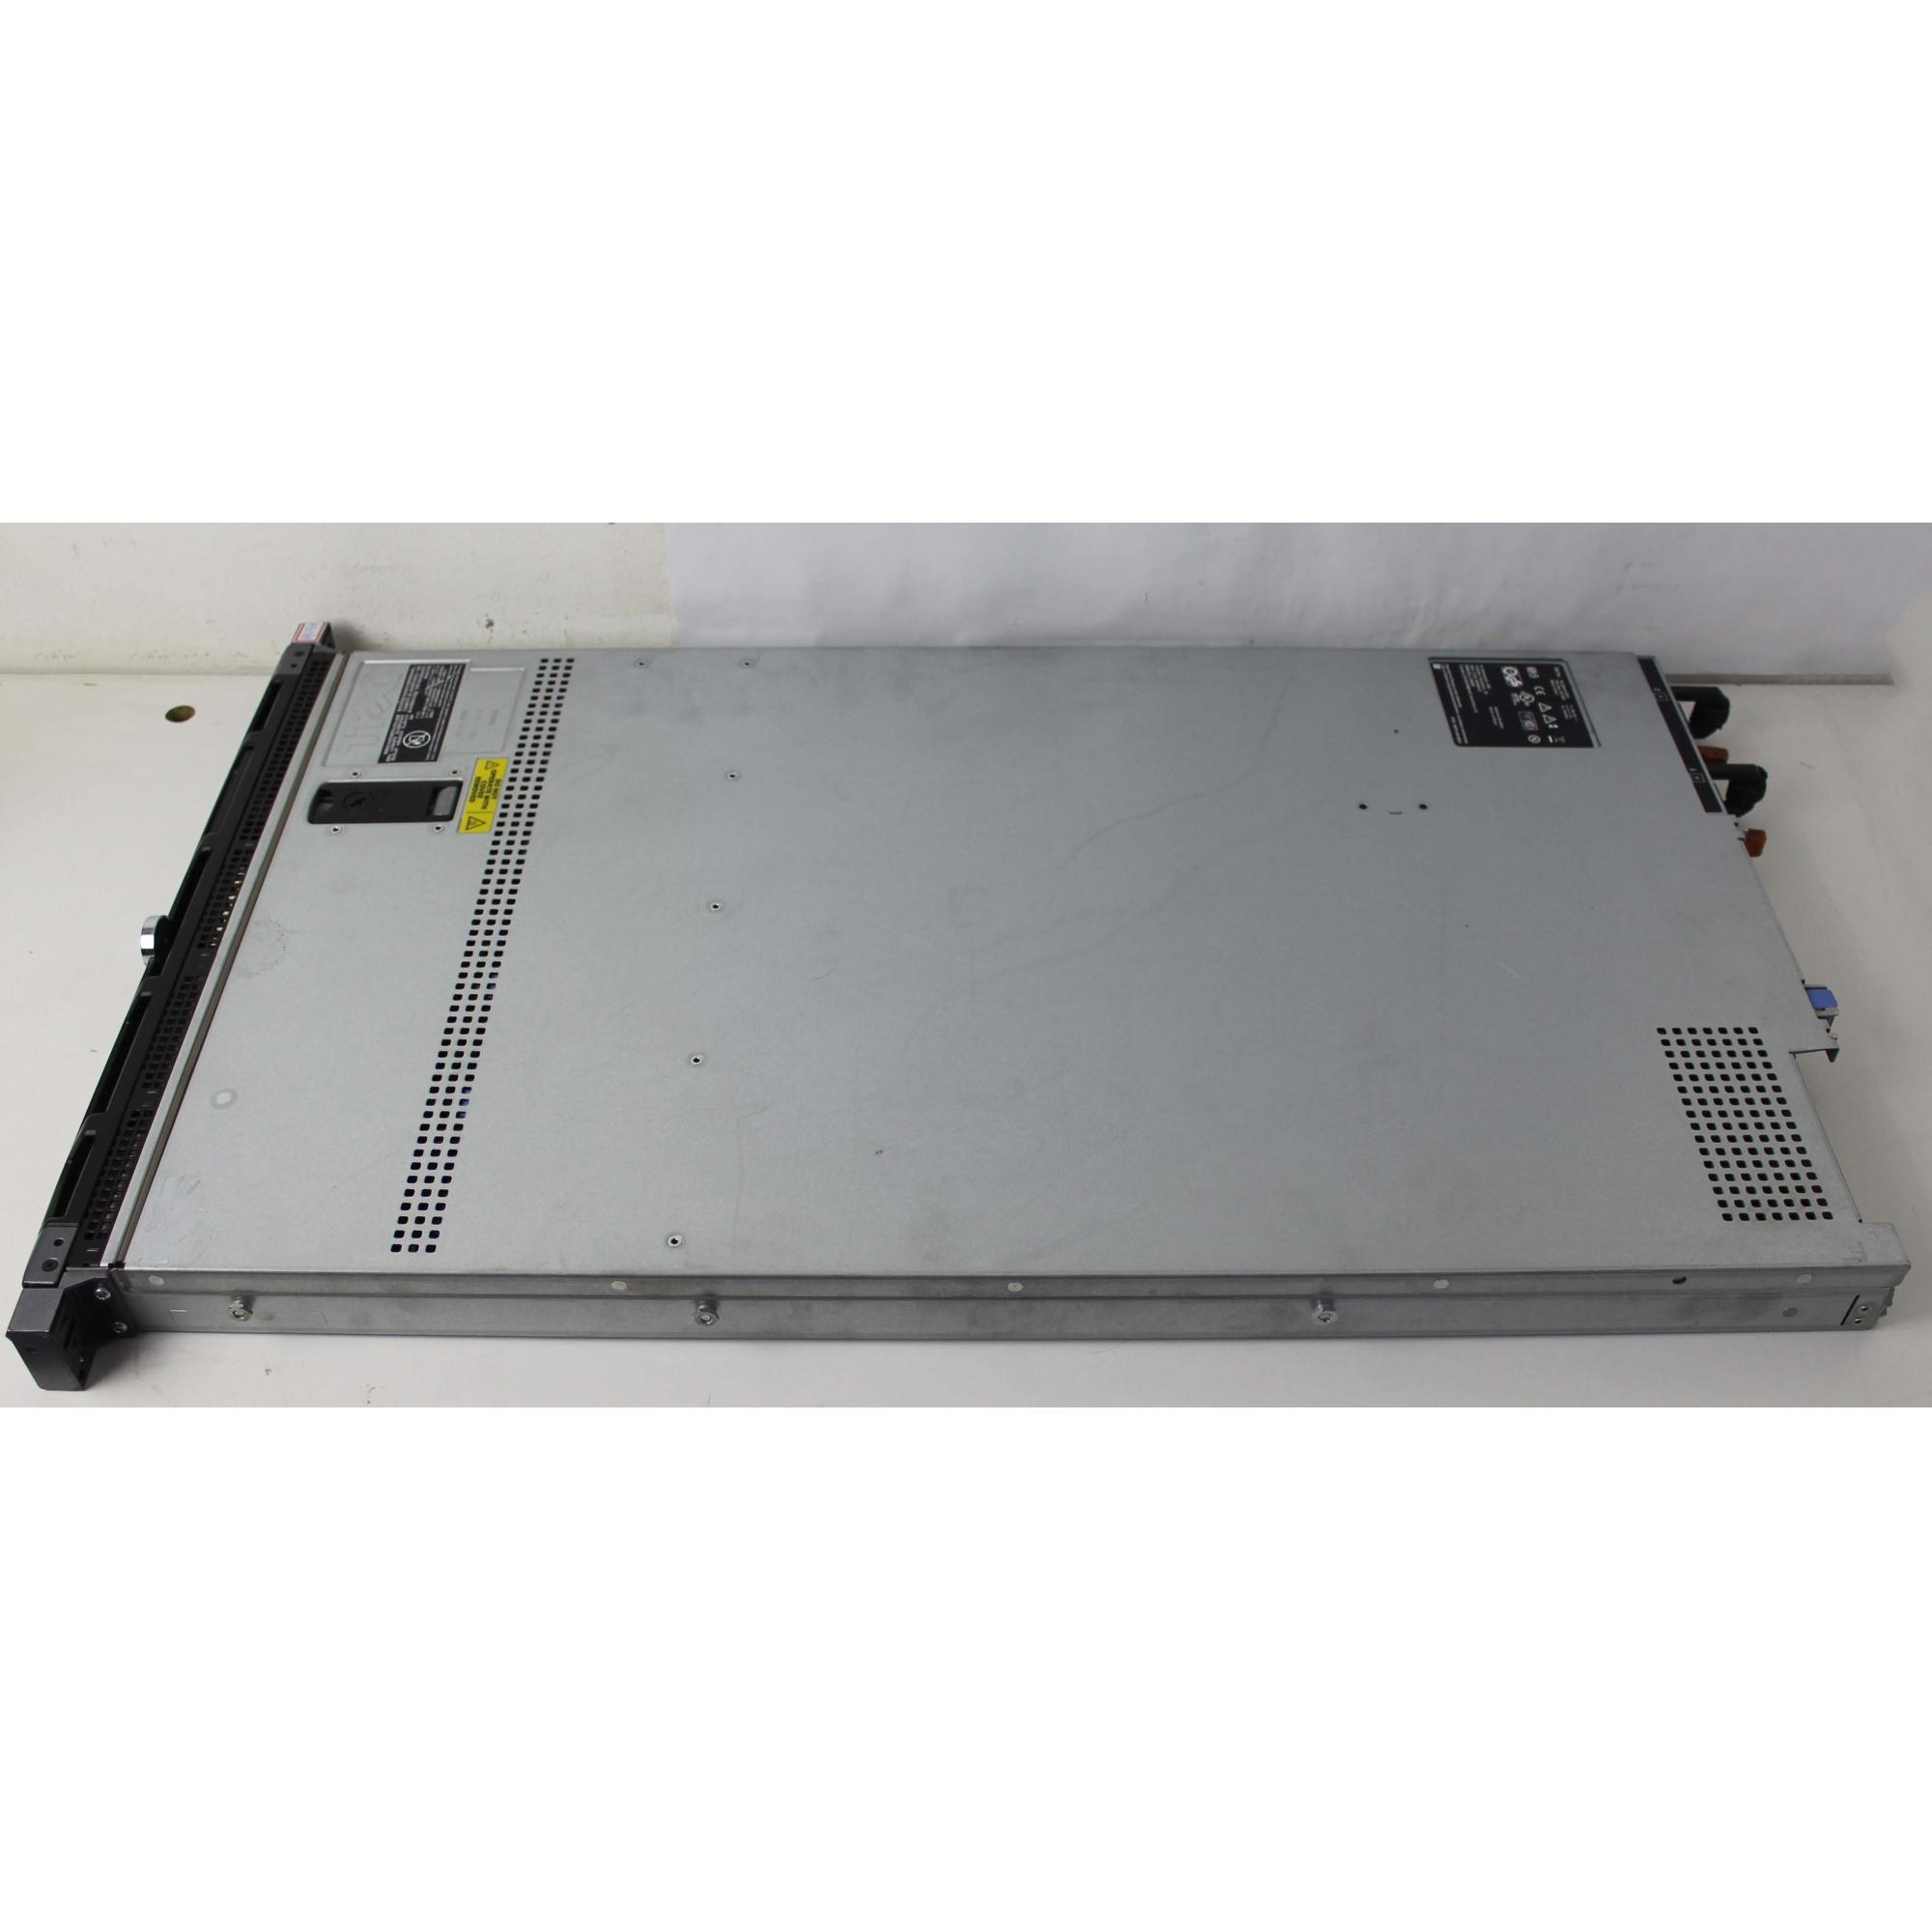 SERVIDOR DELL POWEREDGE R610 INTEL XEON 2.53GHZ 16GB HD-300GB (NÃO ENVIAMOS)